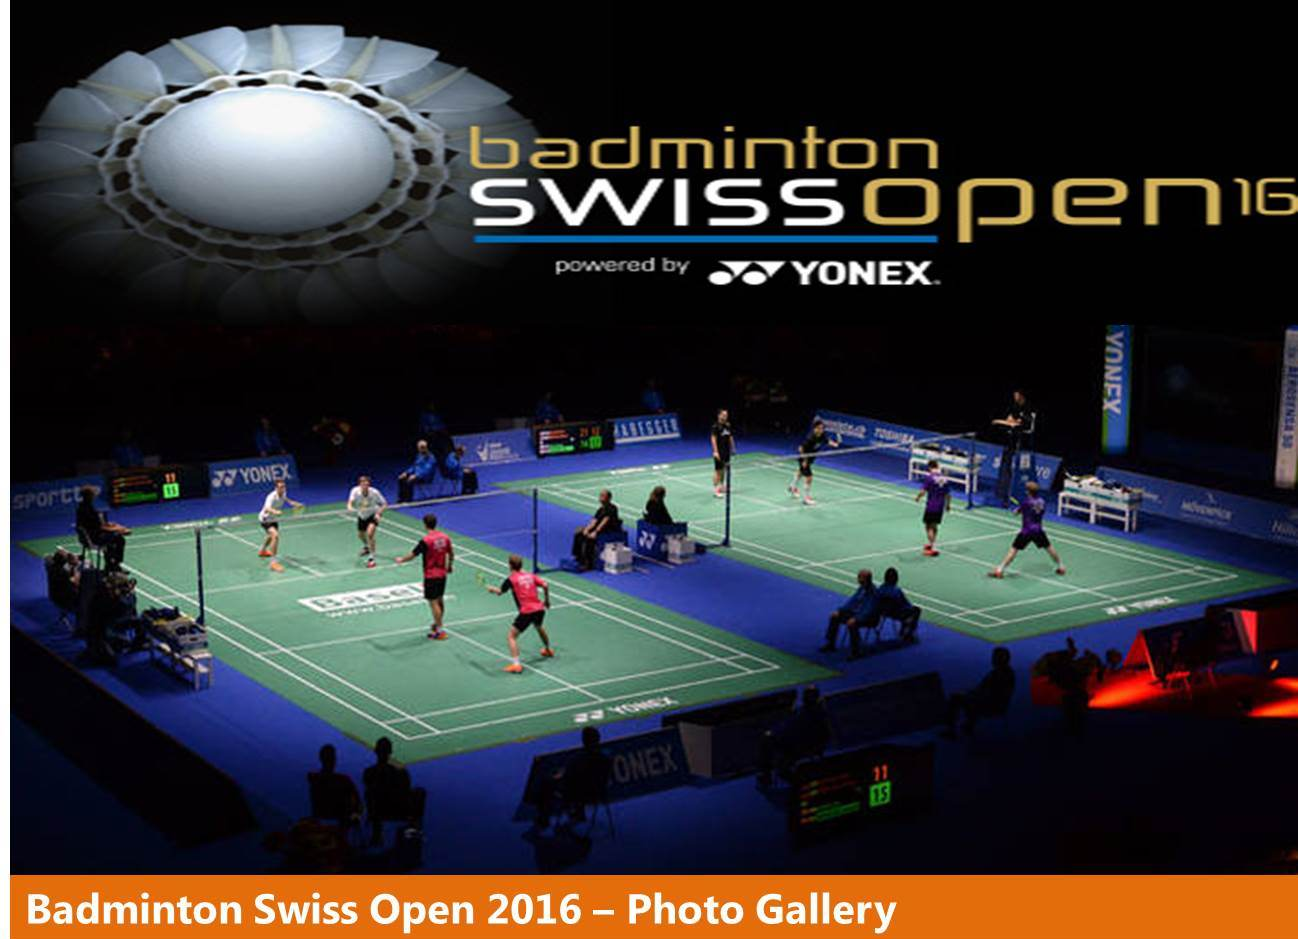 گالری تصاویر مسابقات Swiss Open 2016